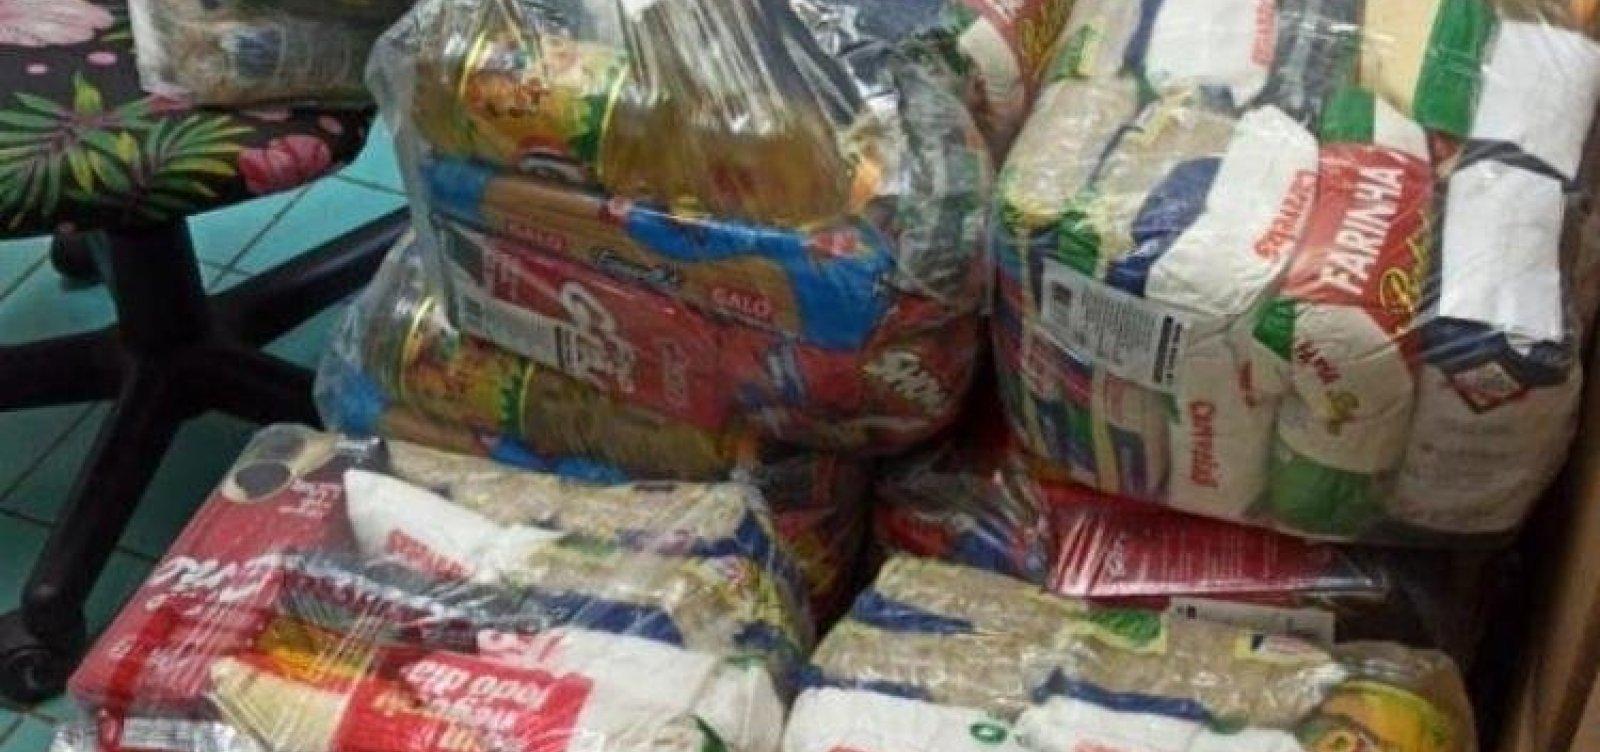 Prefeitura de Salvador inicia entrega de 20 mil cestas básicas